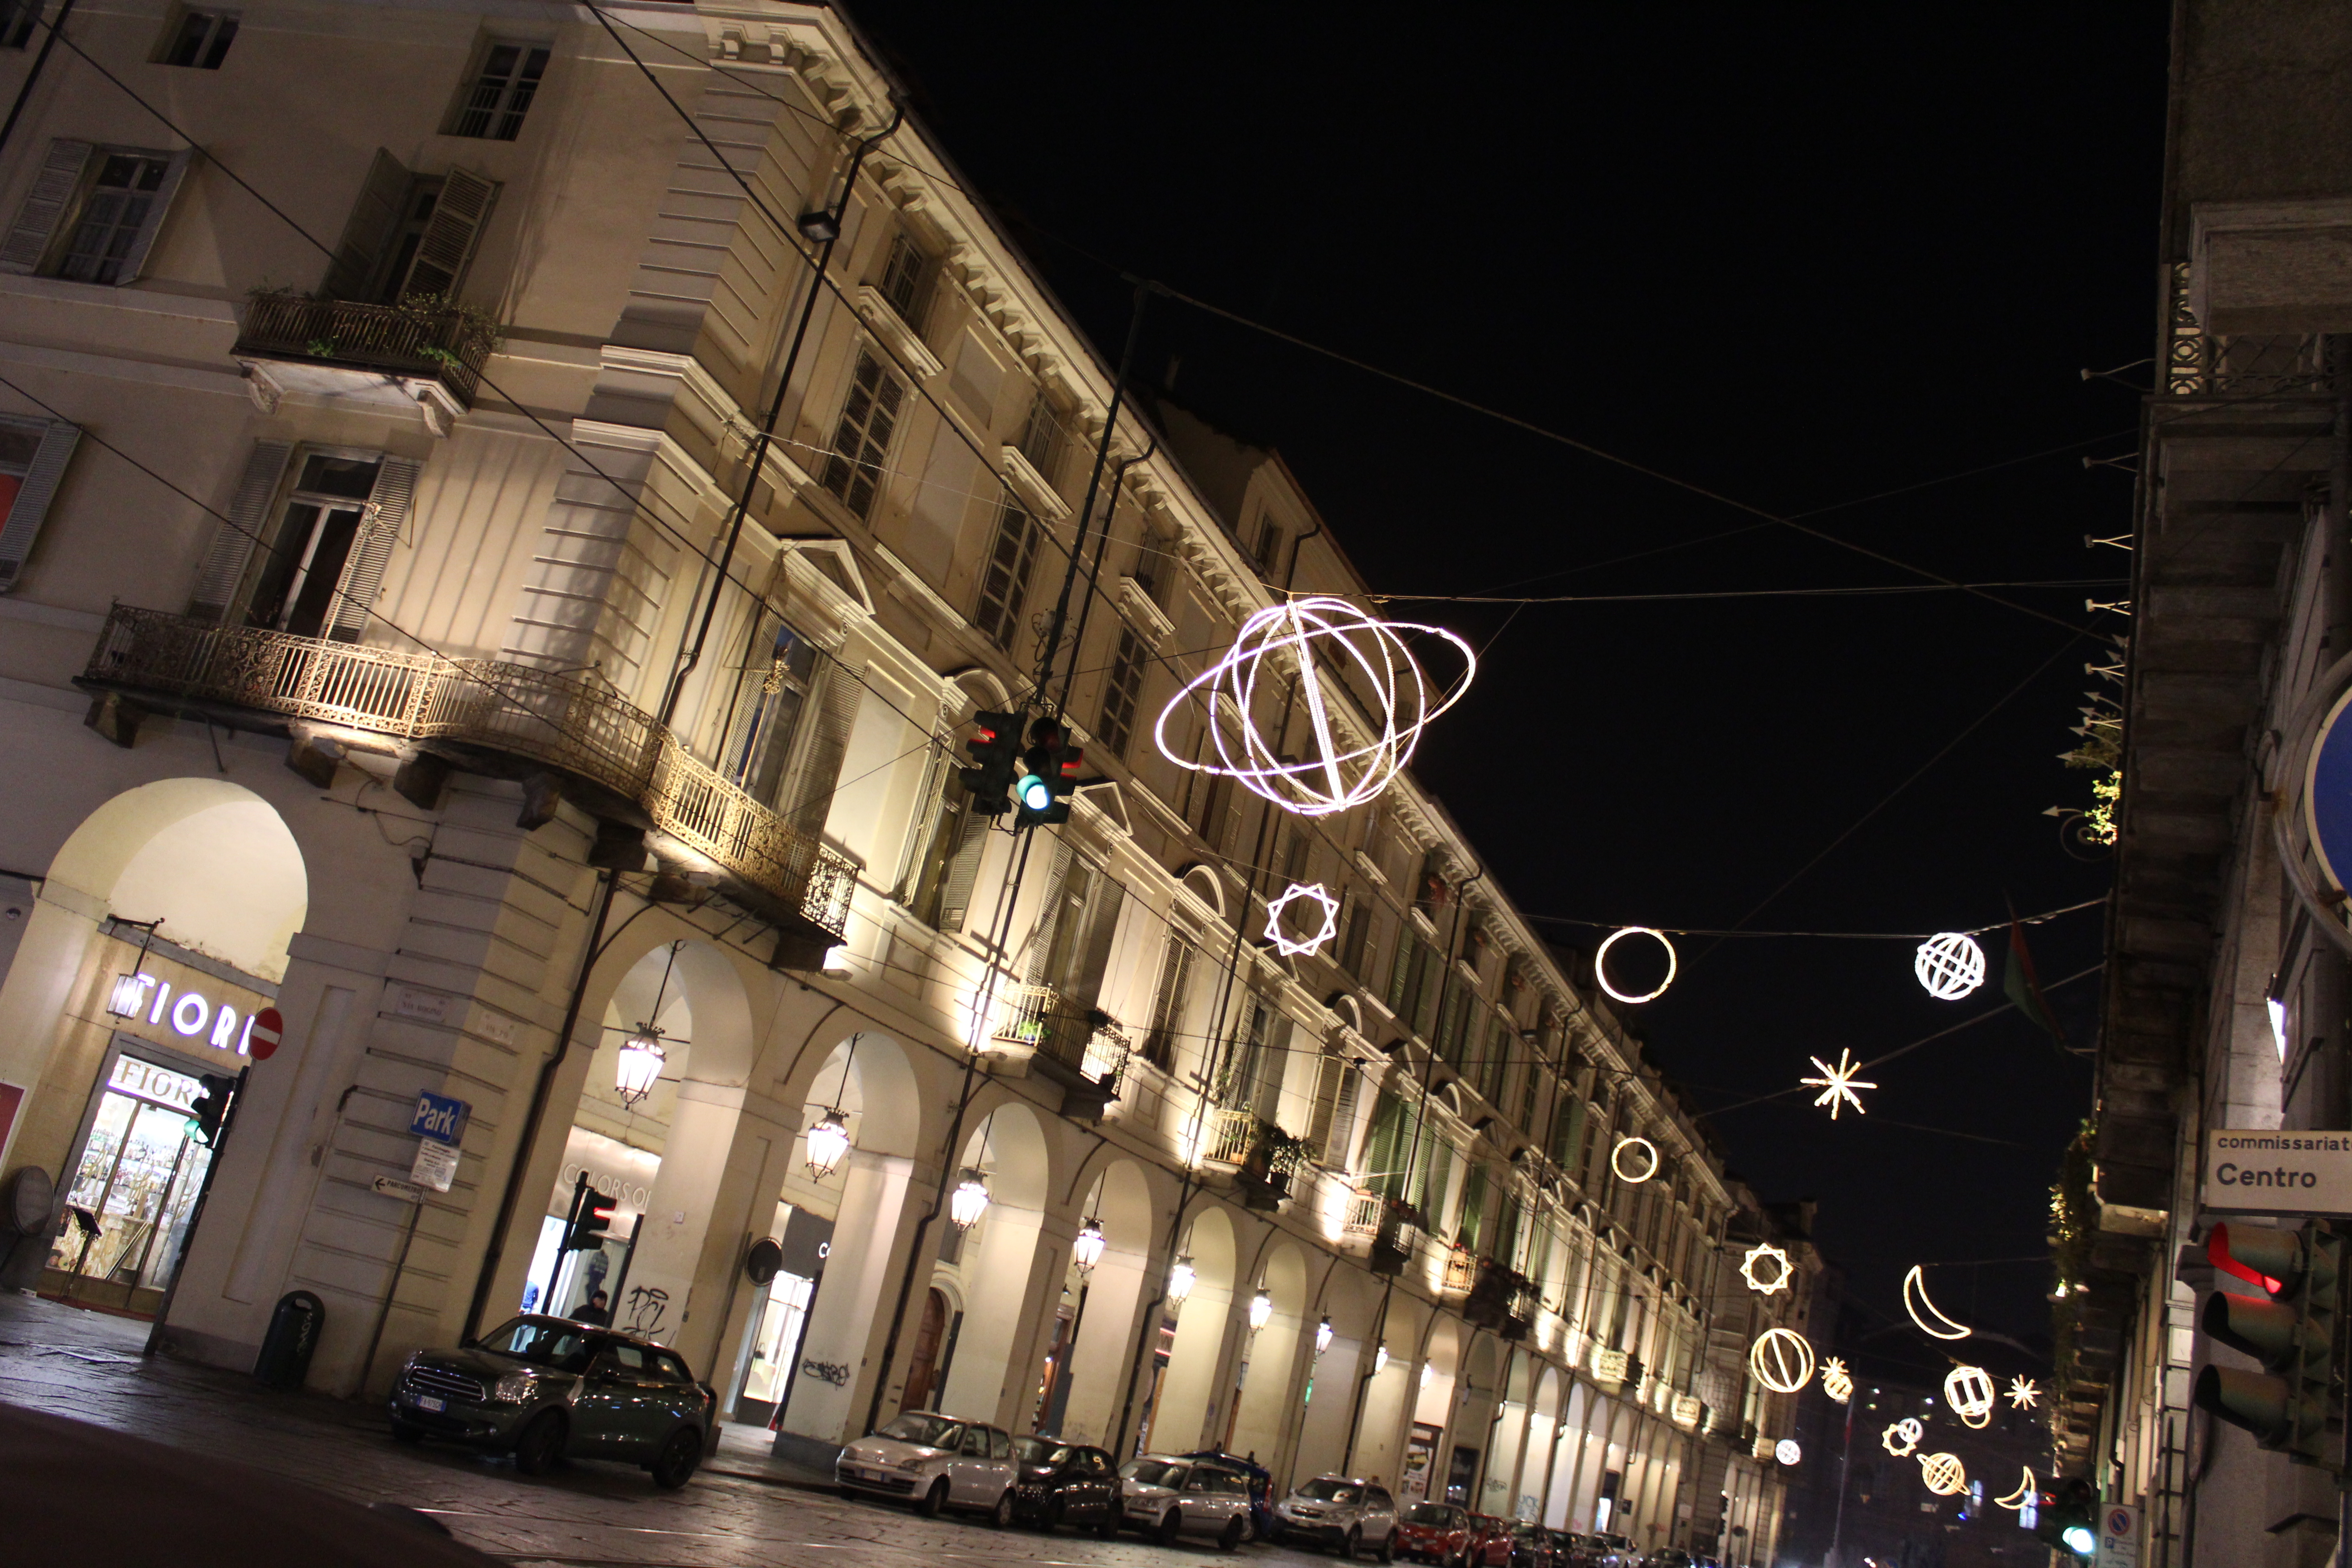 Via Po - Luci d'artista Torino